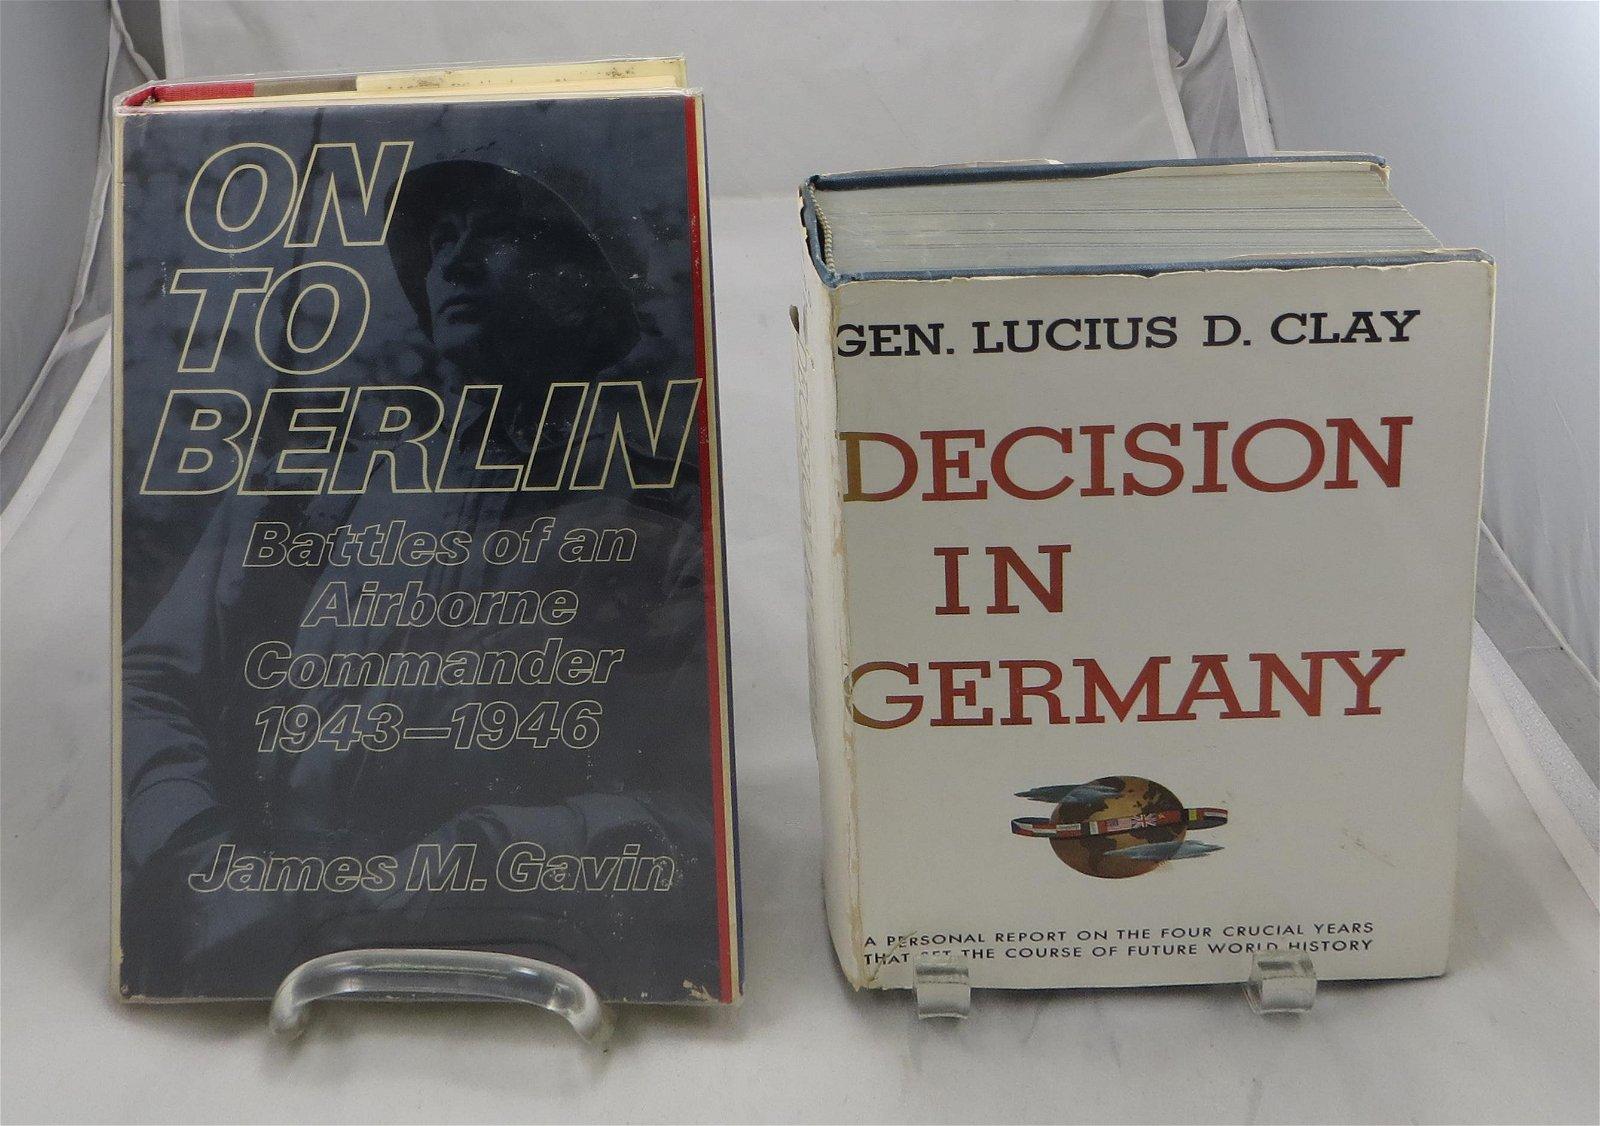 (2) WW2 THEME BOOKS, GEN. CLAY and GEN. GAVIN